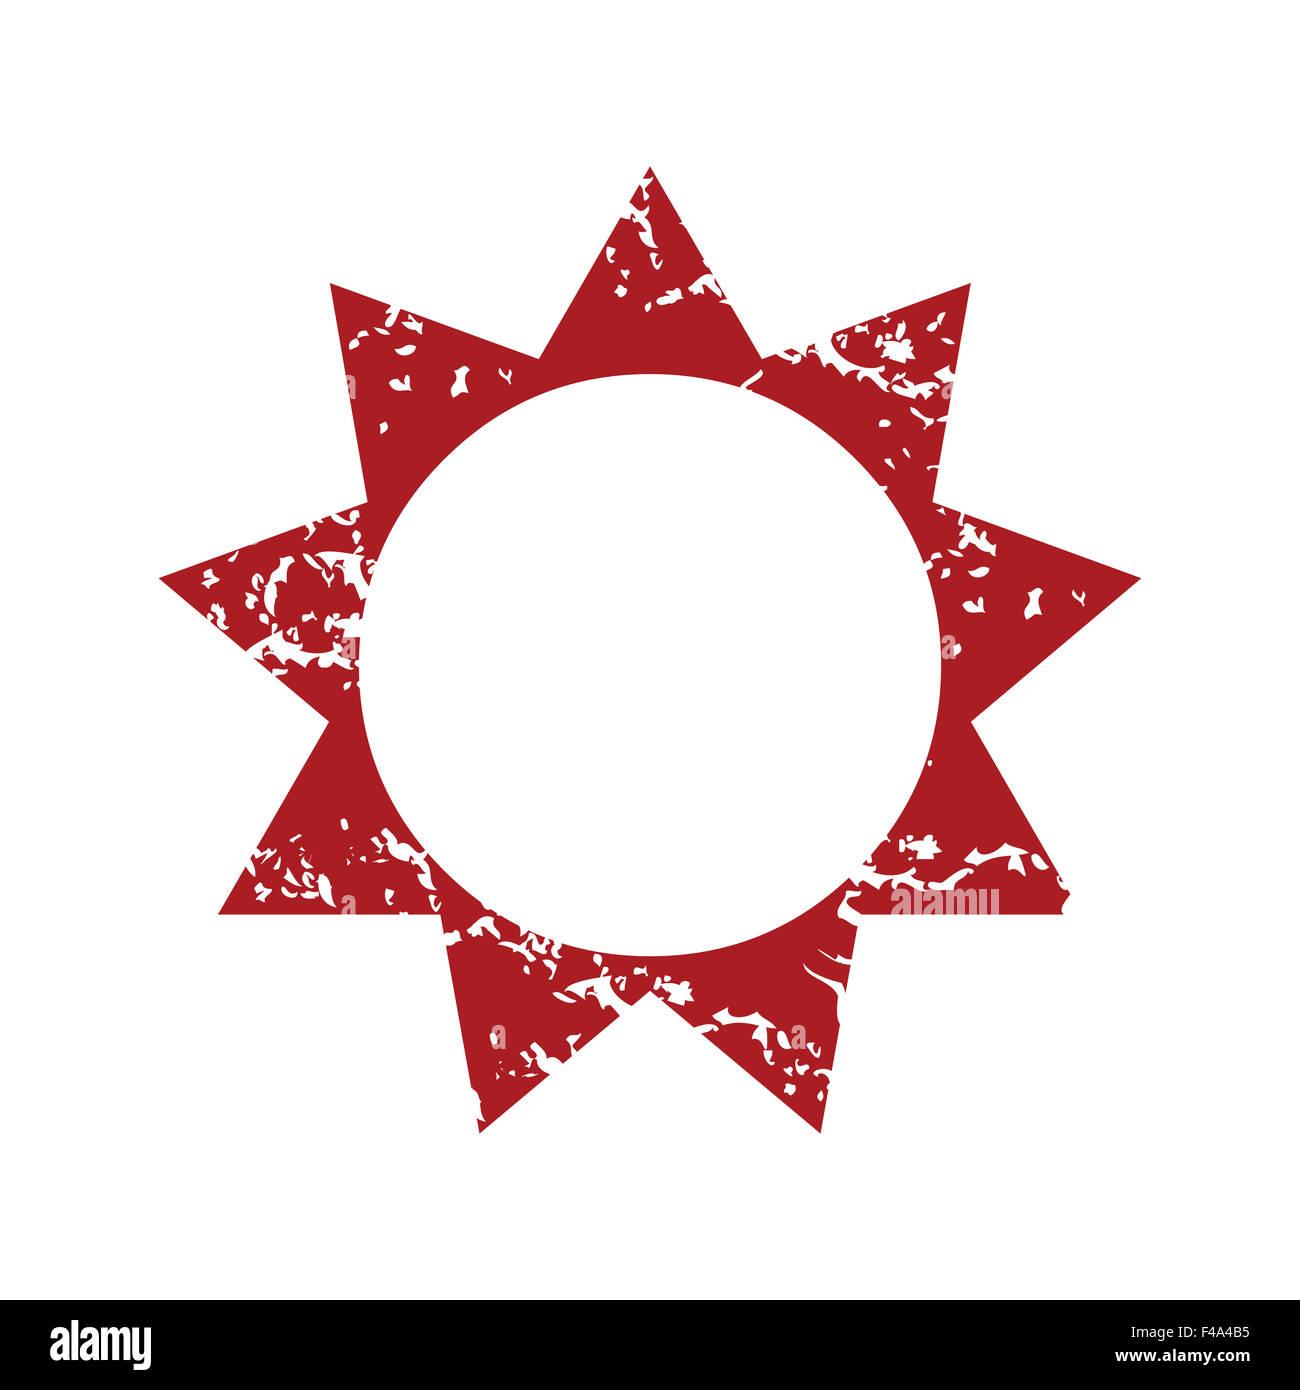 Red grunge sun logo stock photo royalty free image 88733433 alamy red grunge sun logo buycottarizona Images